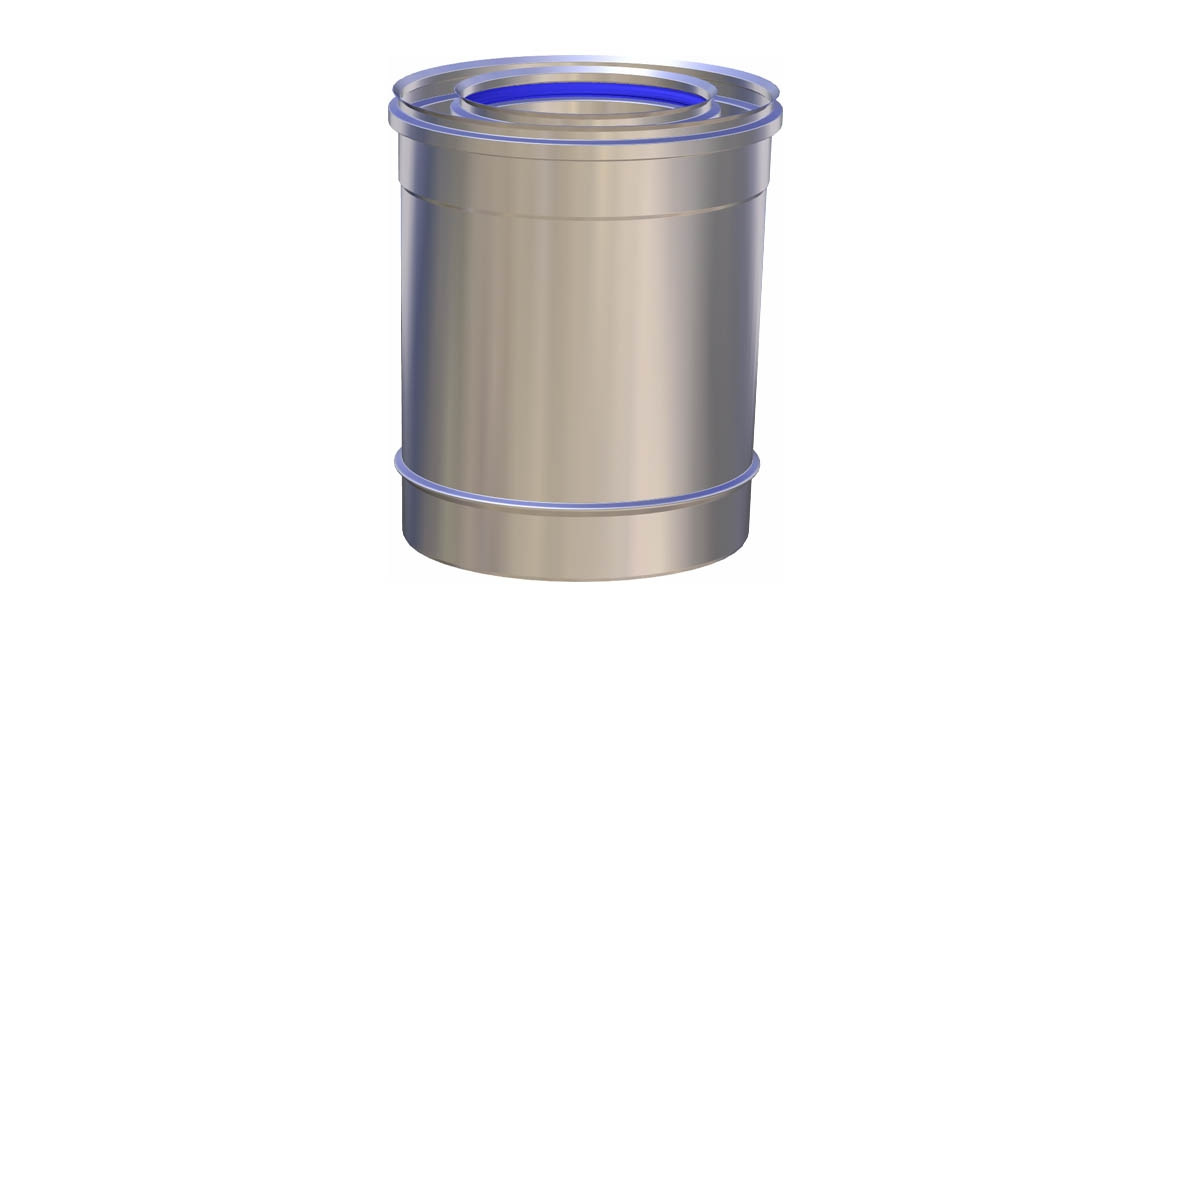 Concentrisch kachelpijp pelletkachel 25 cm